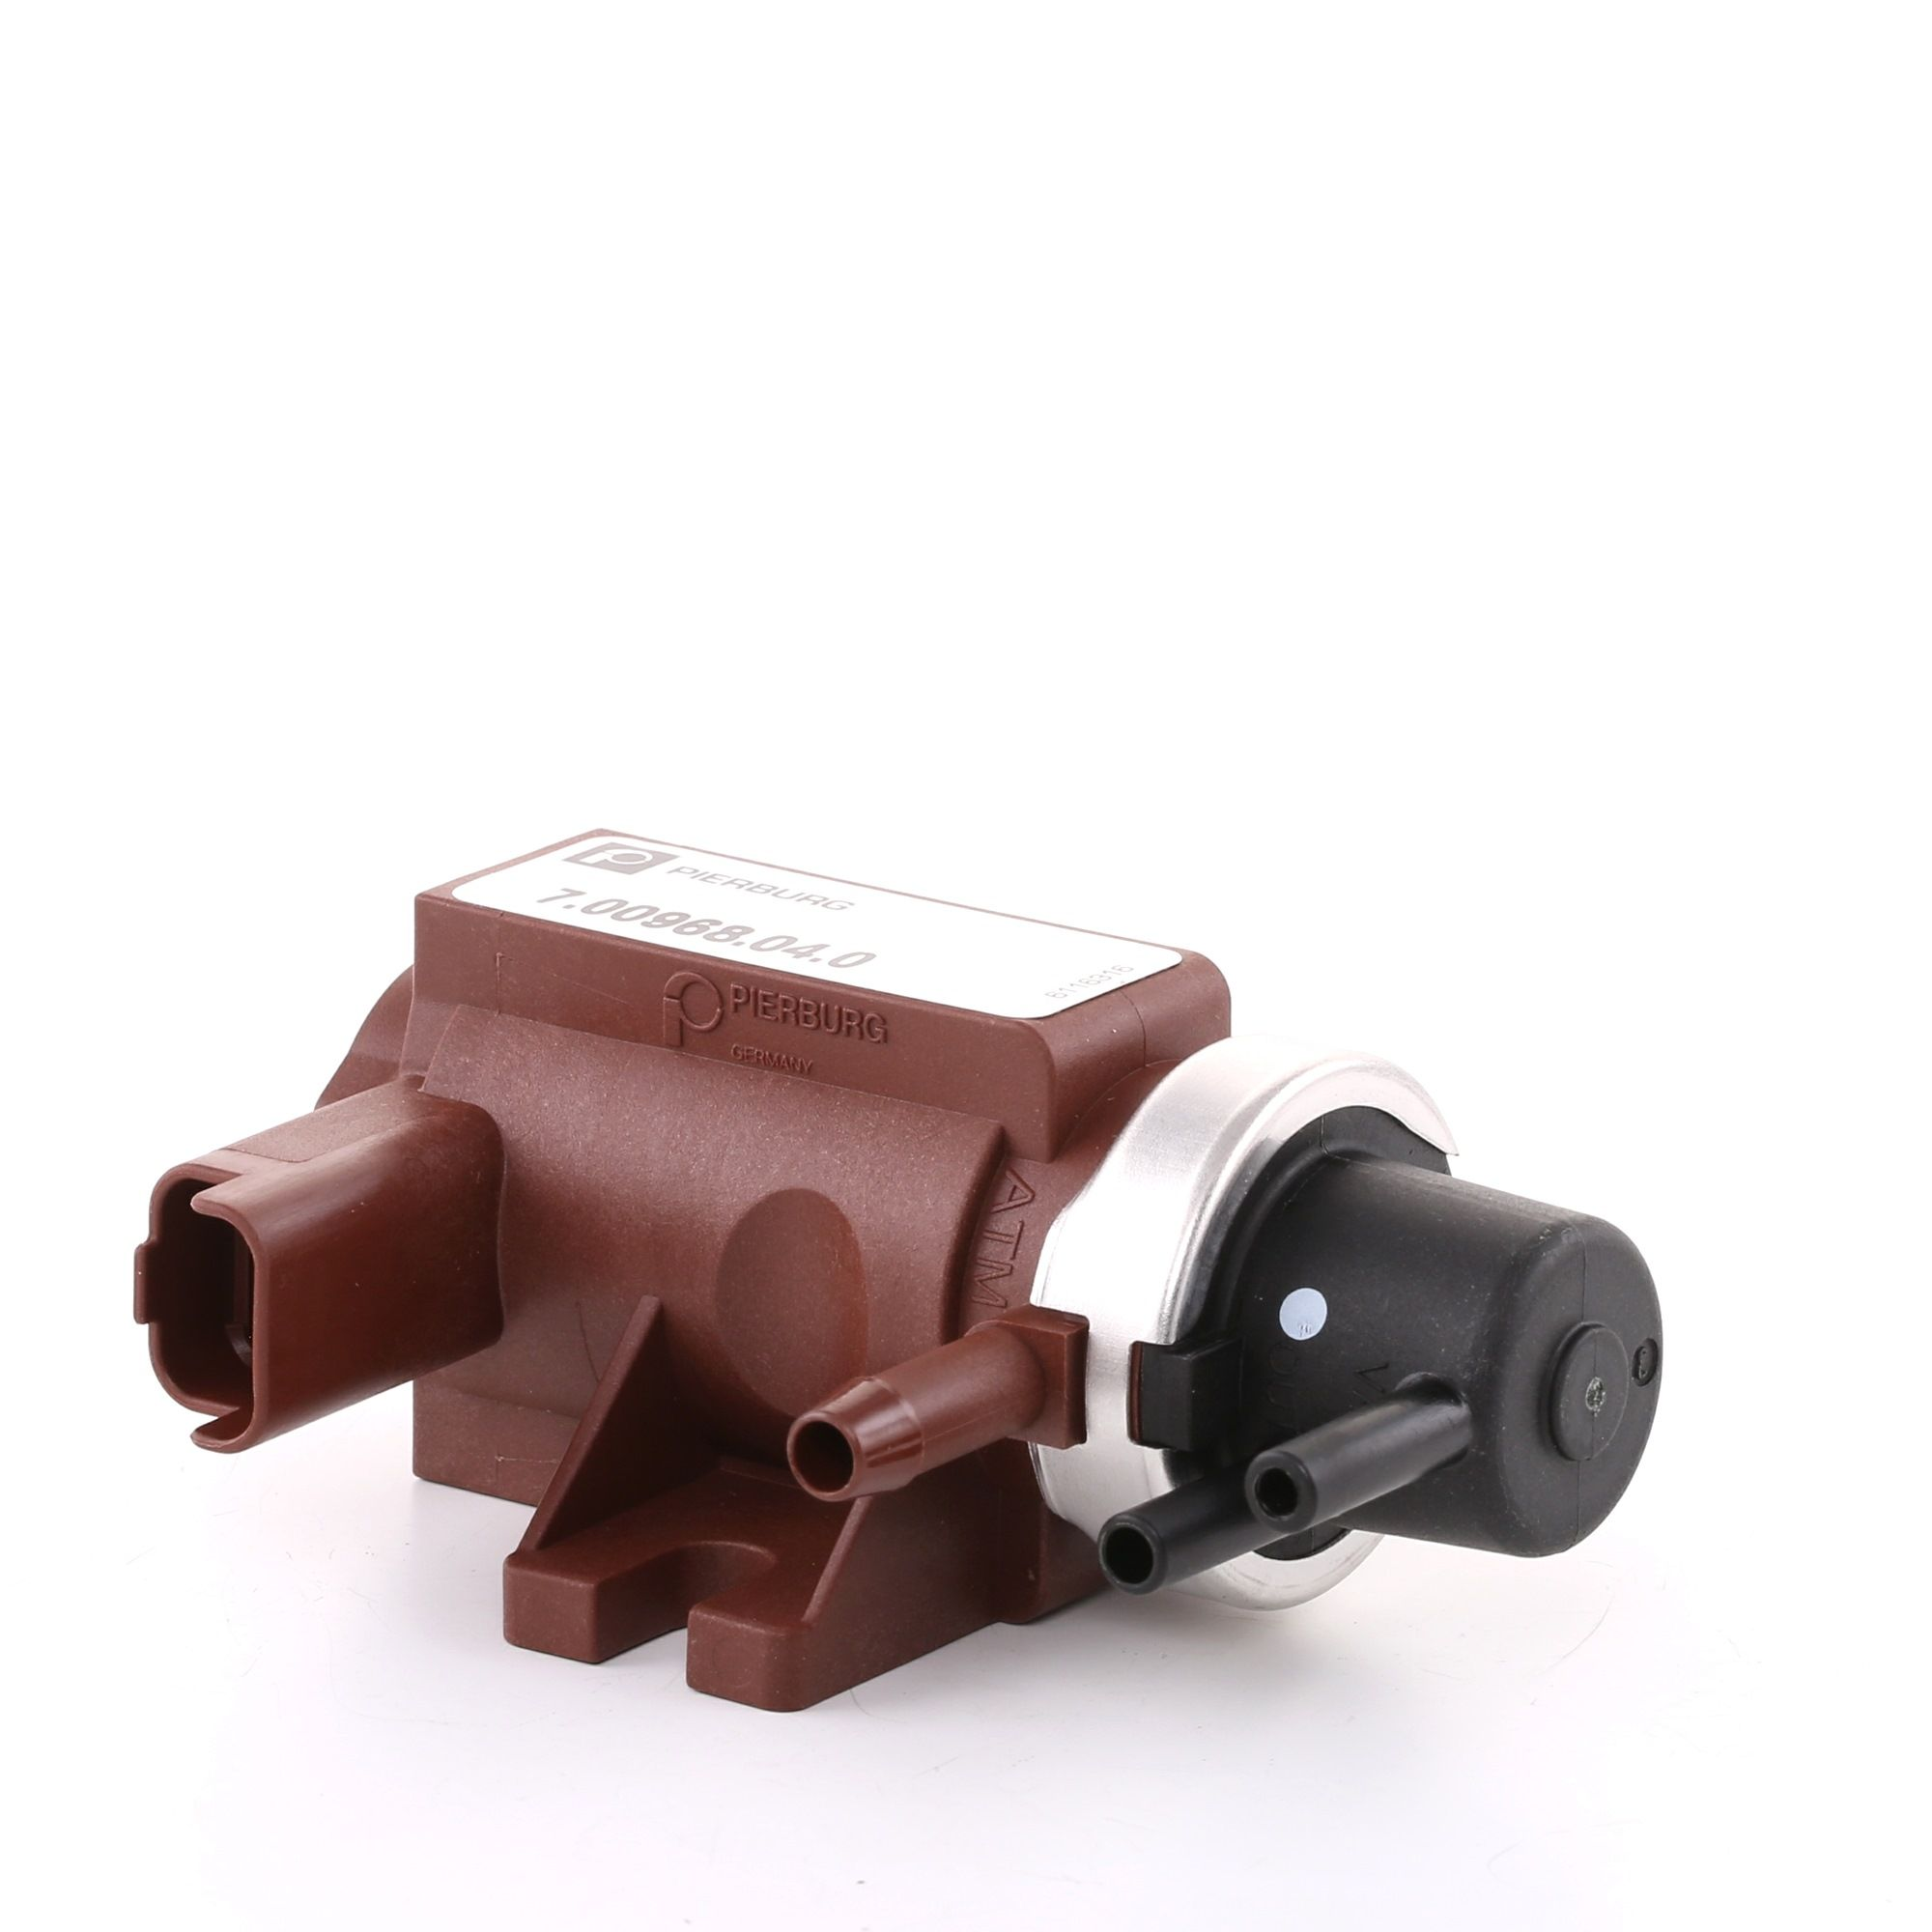 Menic tlaku, turbodmychadlo PIERBURG 7.00968.04.0 Hodnocení